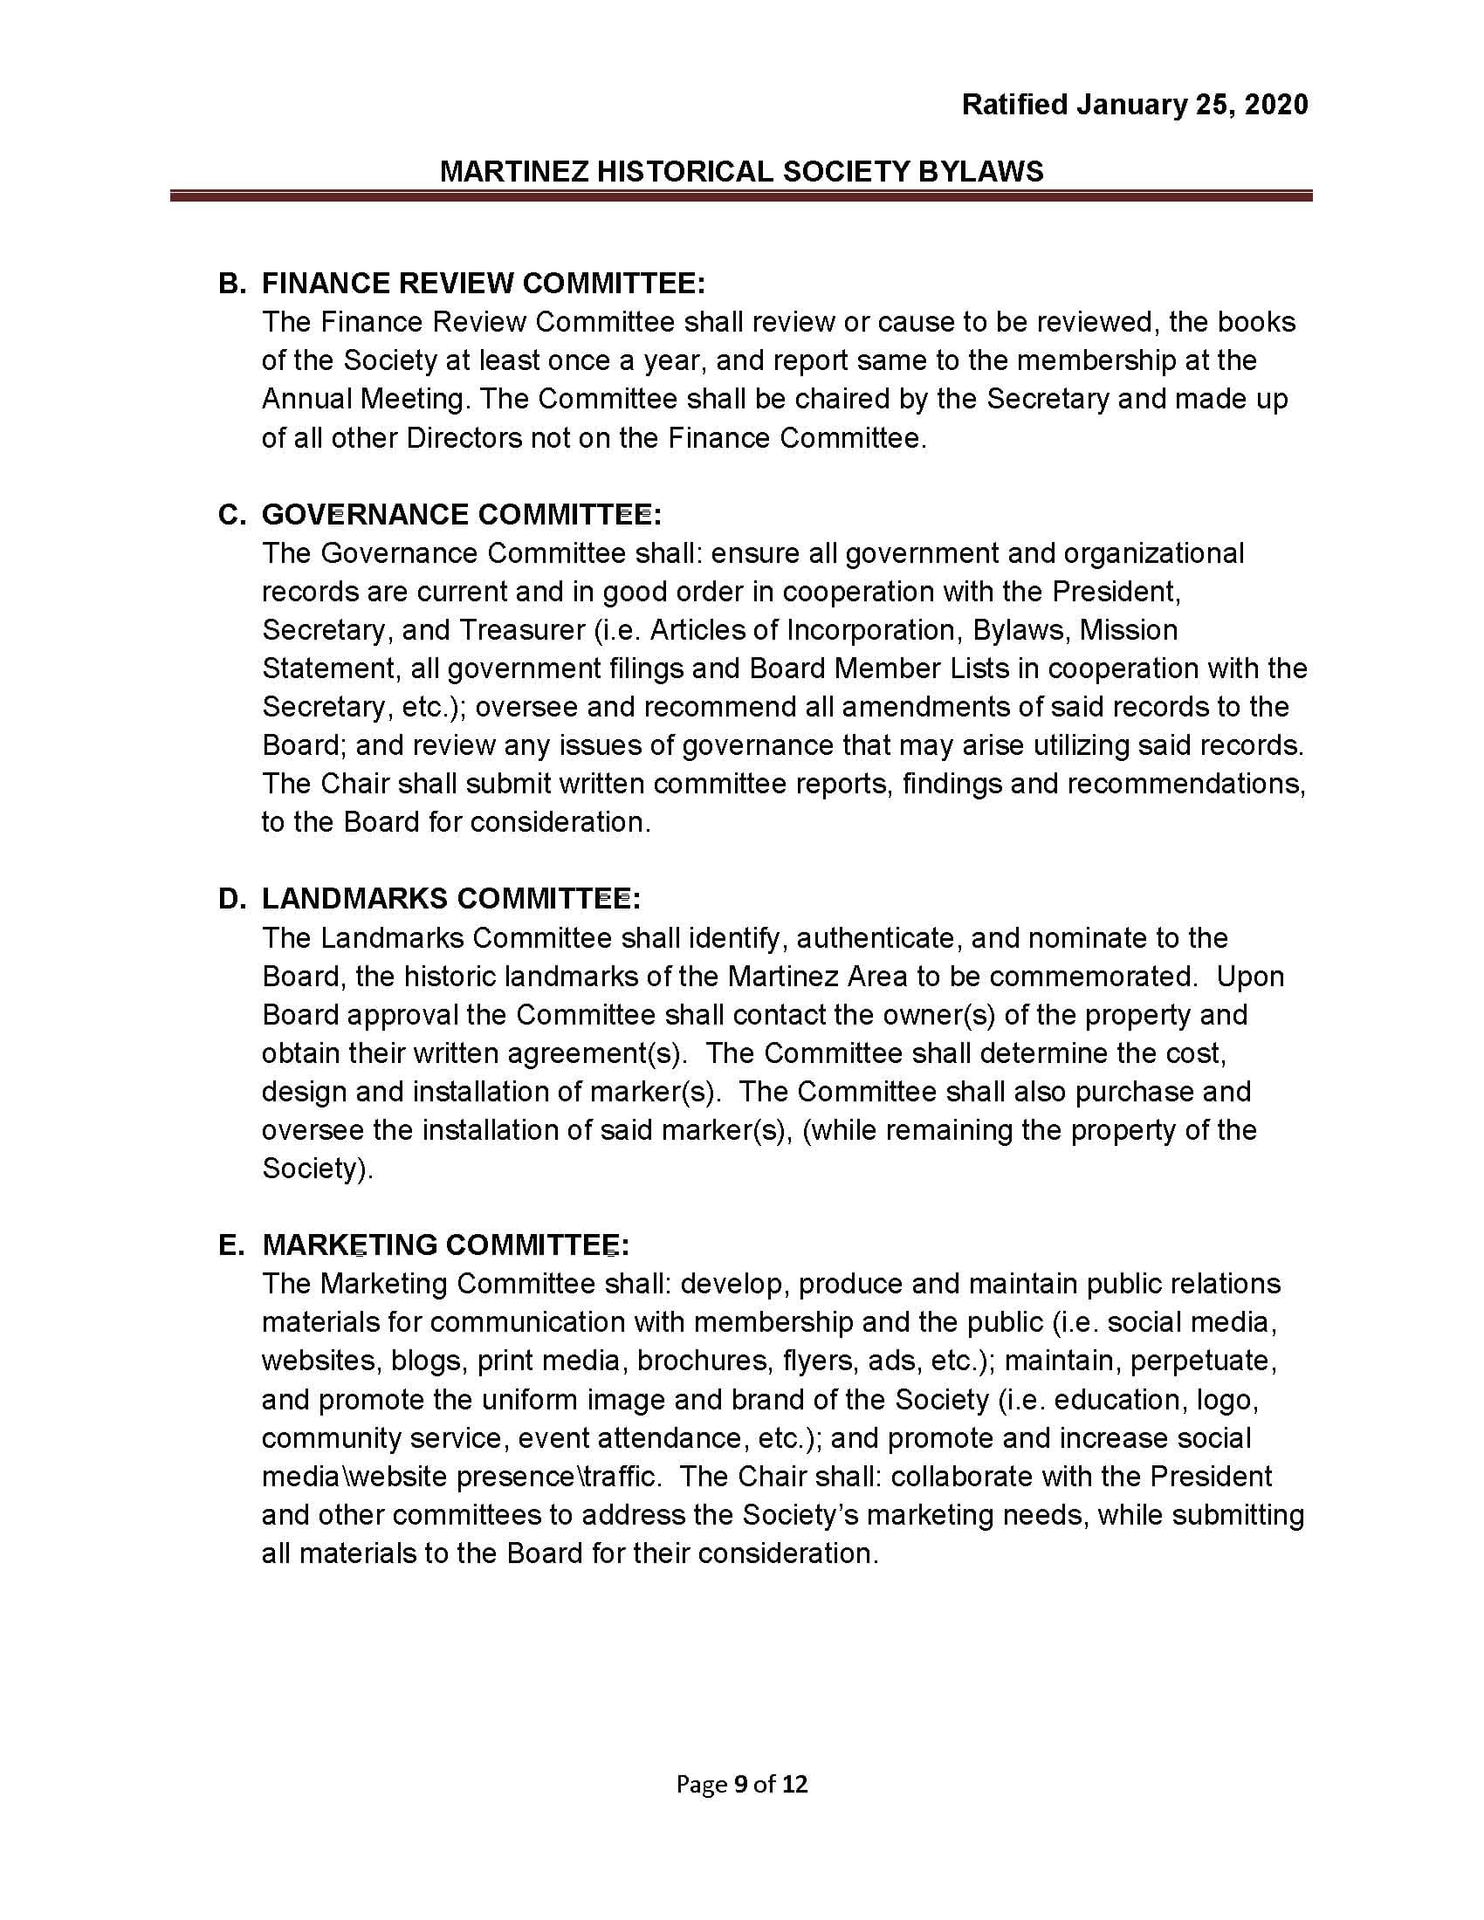 MHS Bylaws Rev 2020-01_Page_09